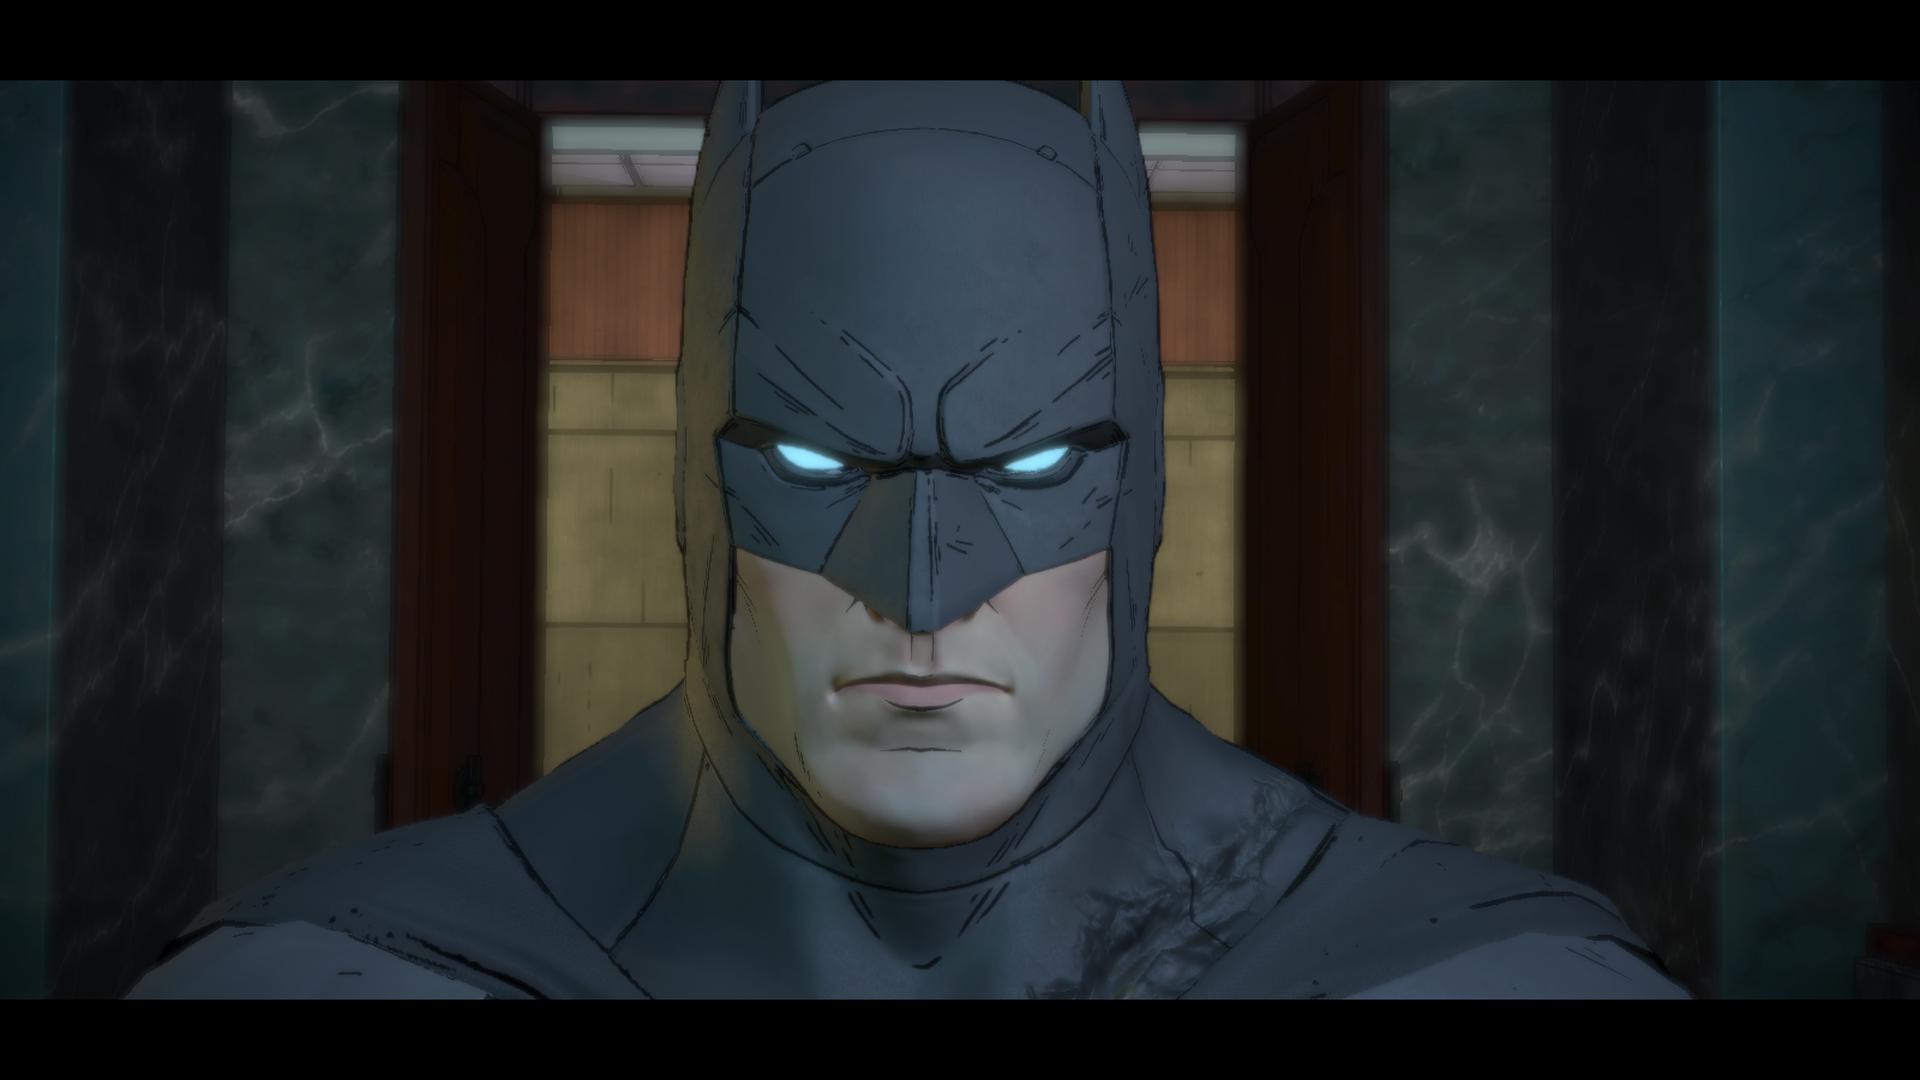 Image Courtesy of Telltale   DC Comics